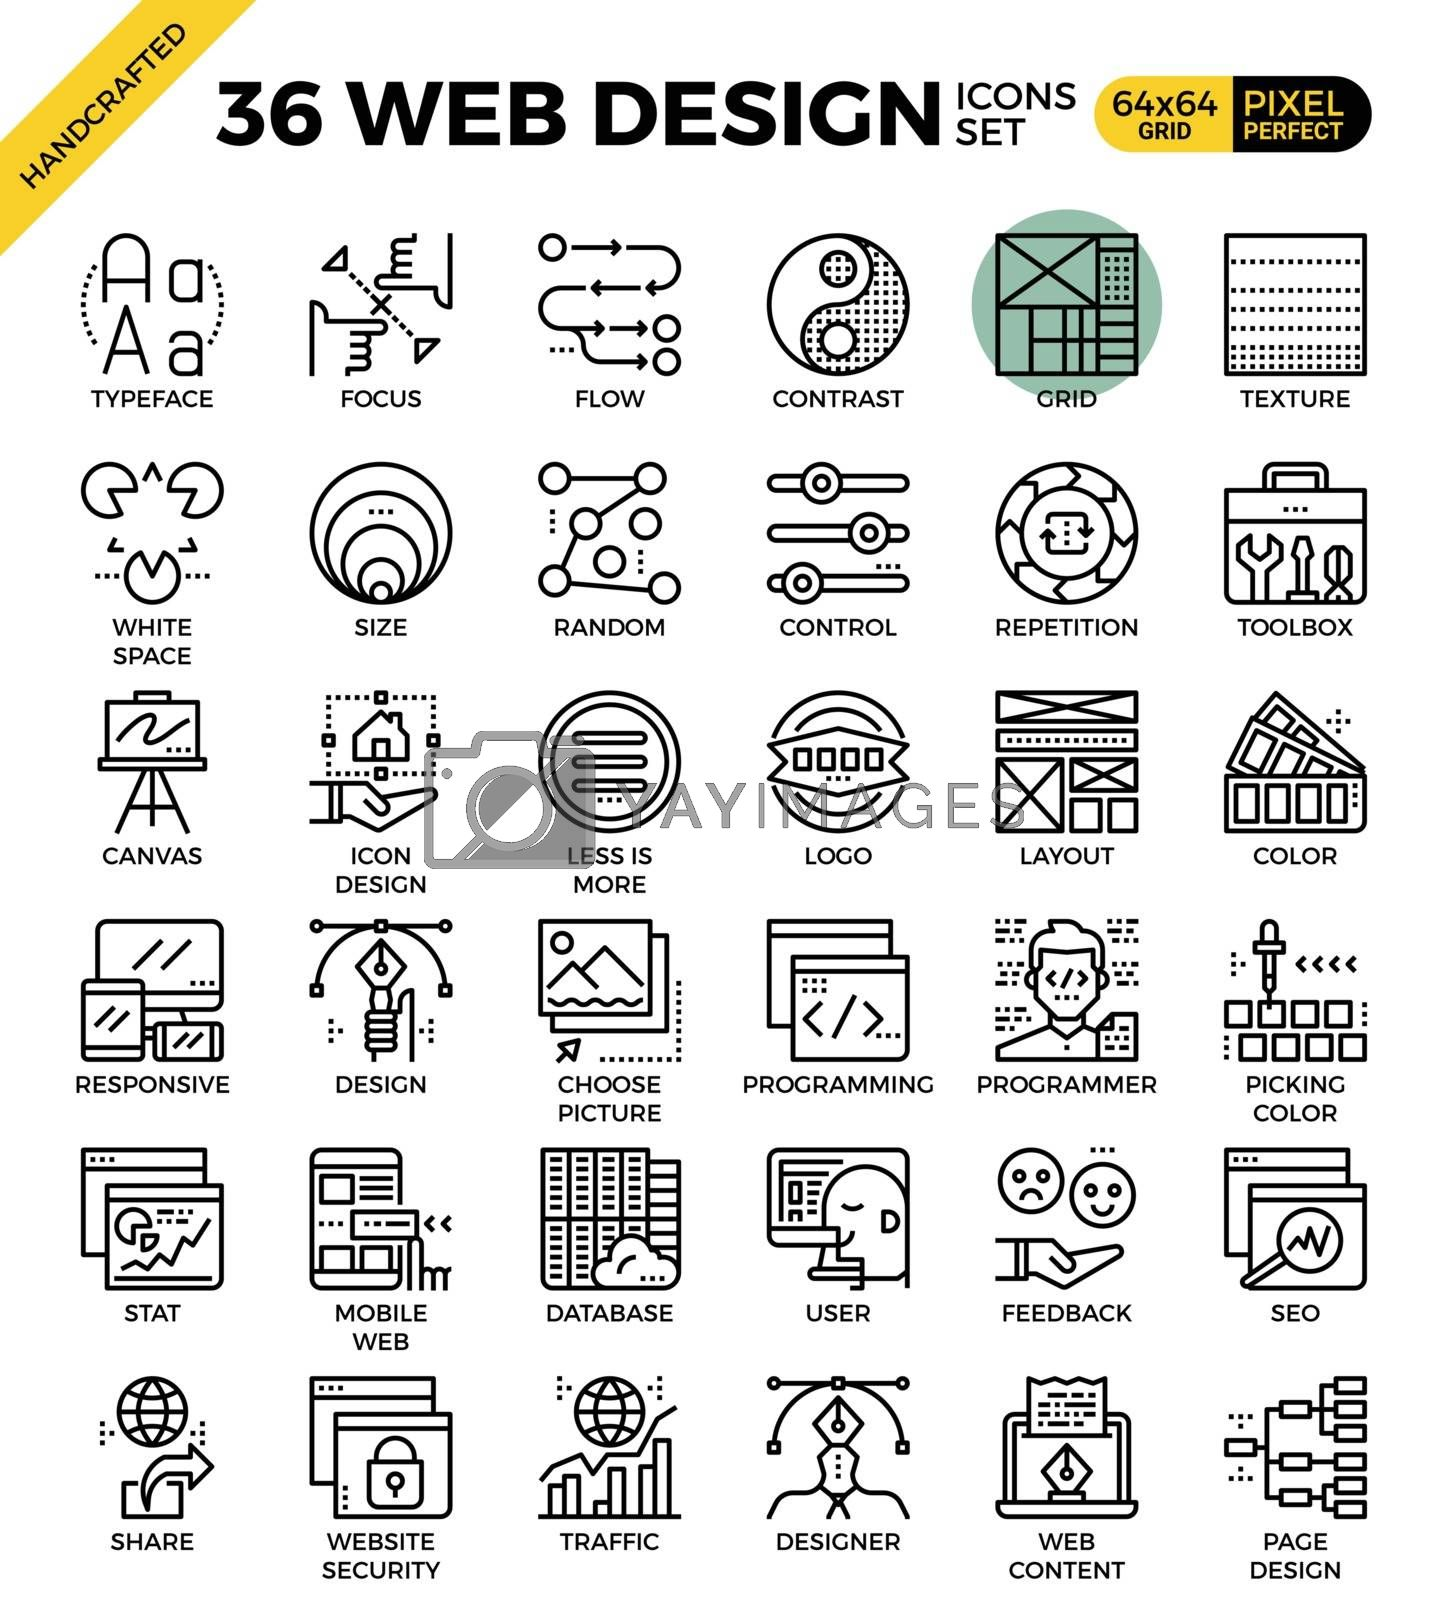 Web design outline icons concept in modern style for website or print illustration